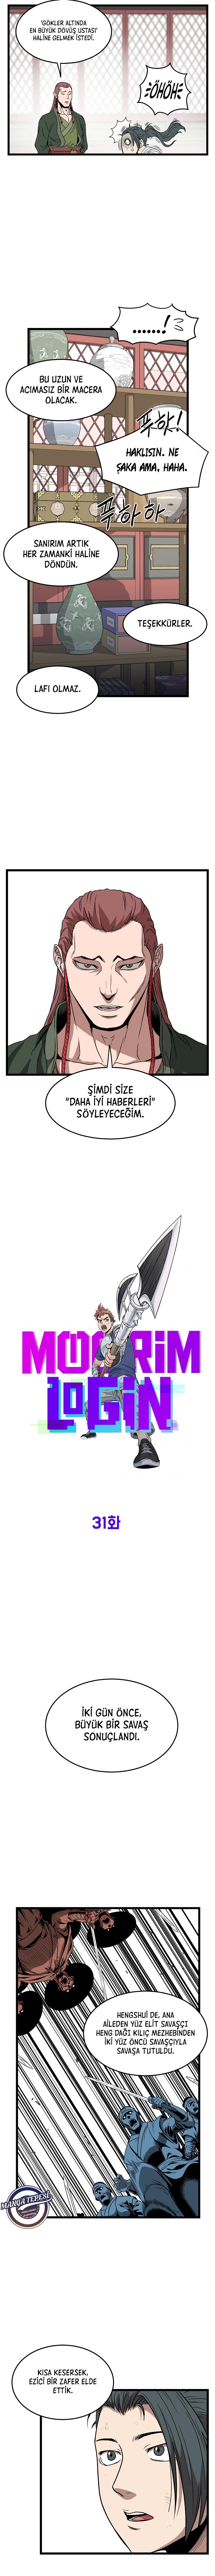 murim-loginbolum-31